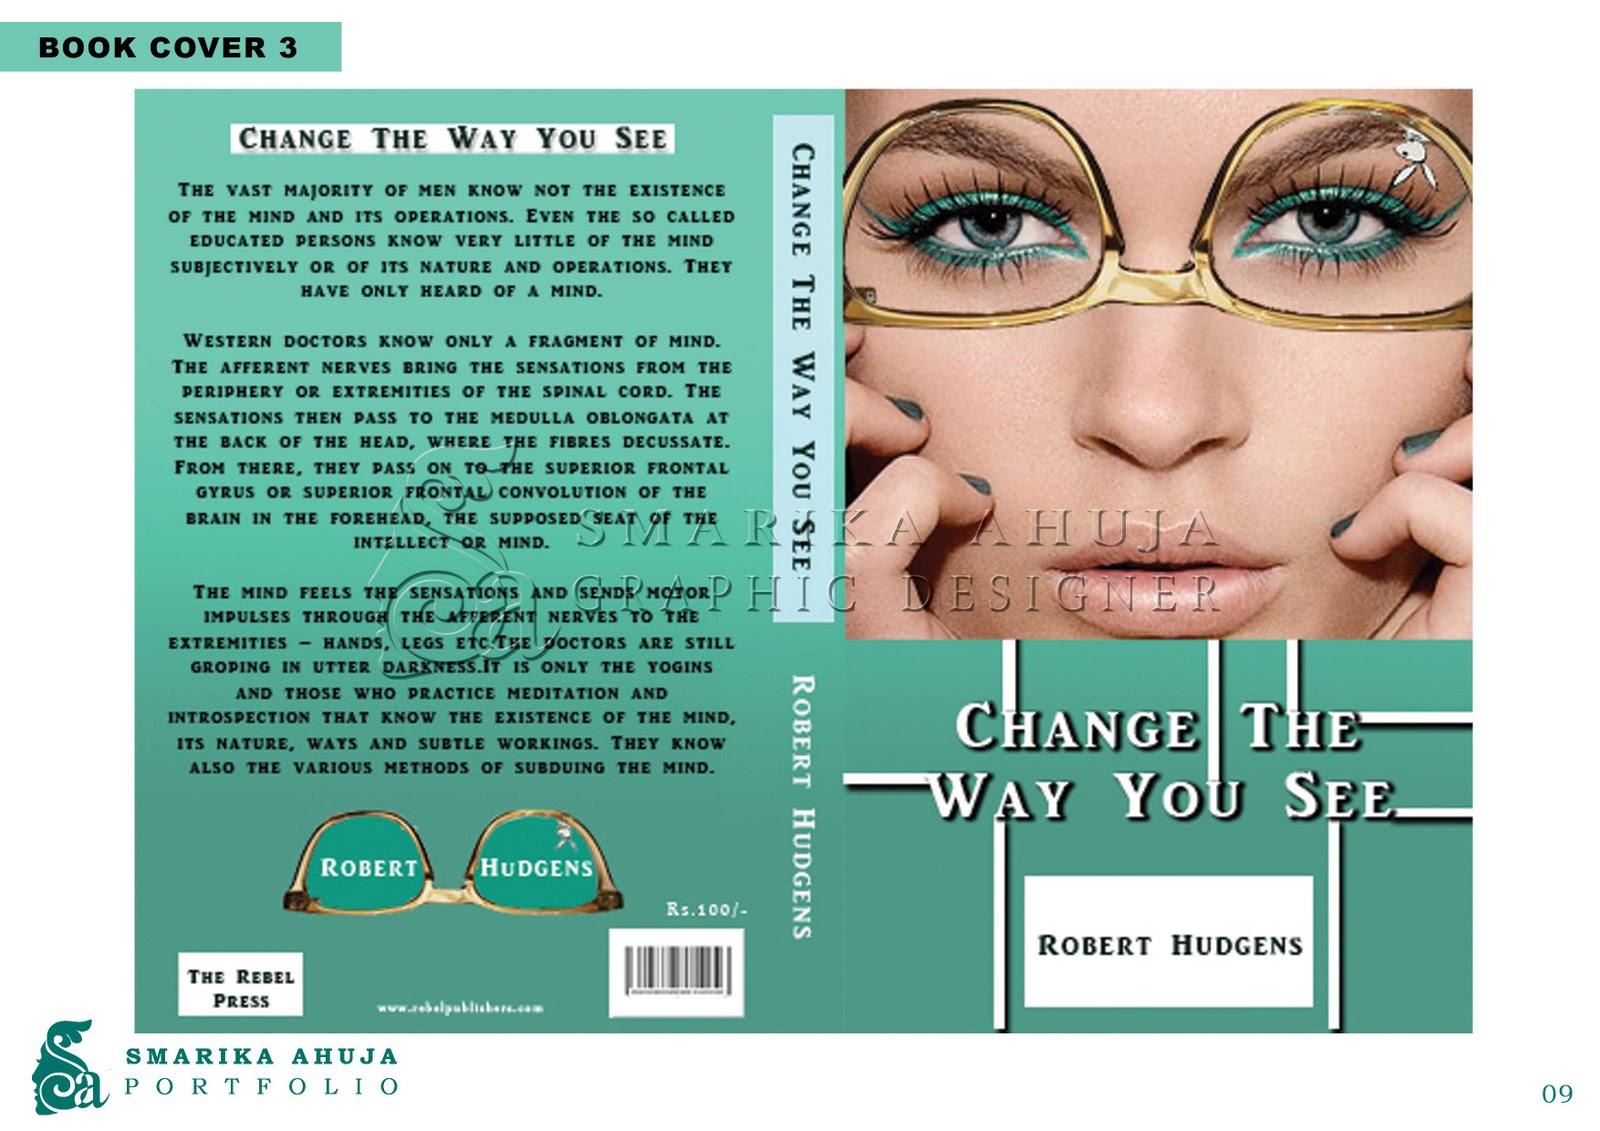 Graphic Design Portfolio Book Cover